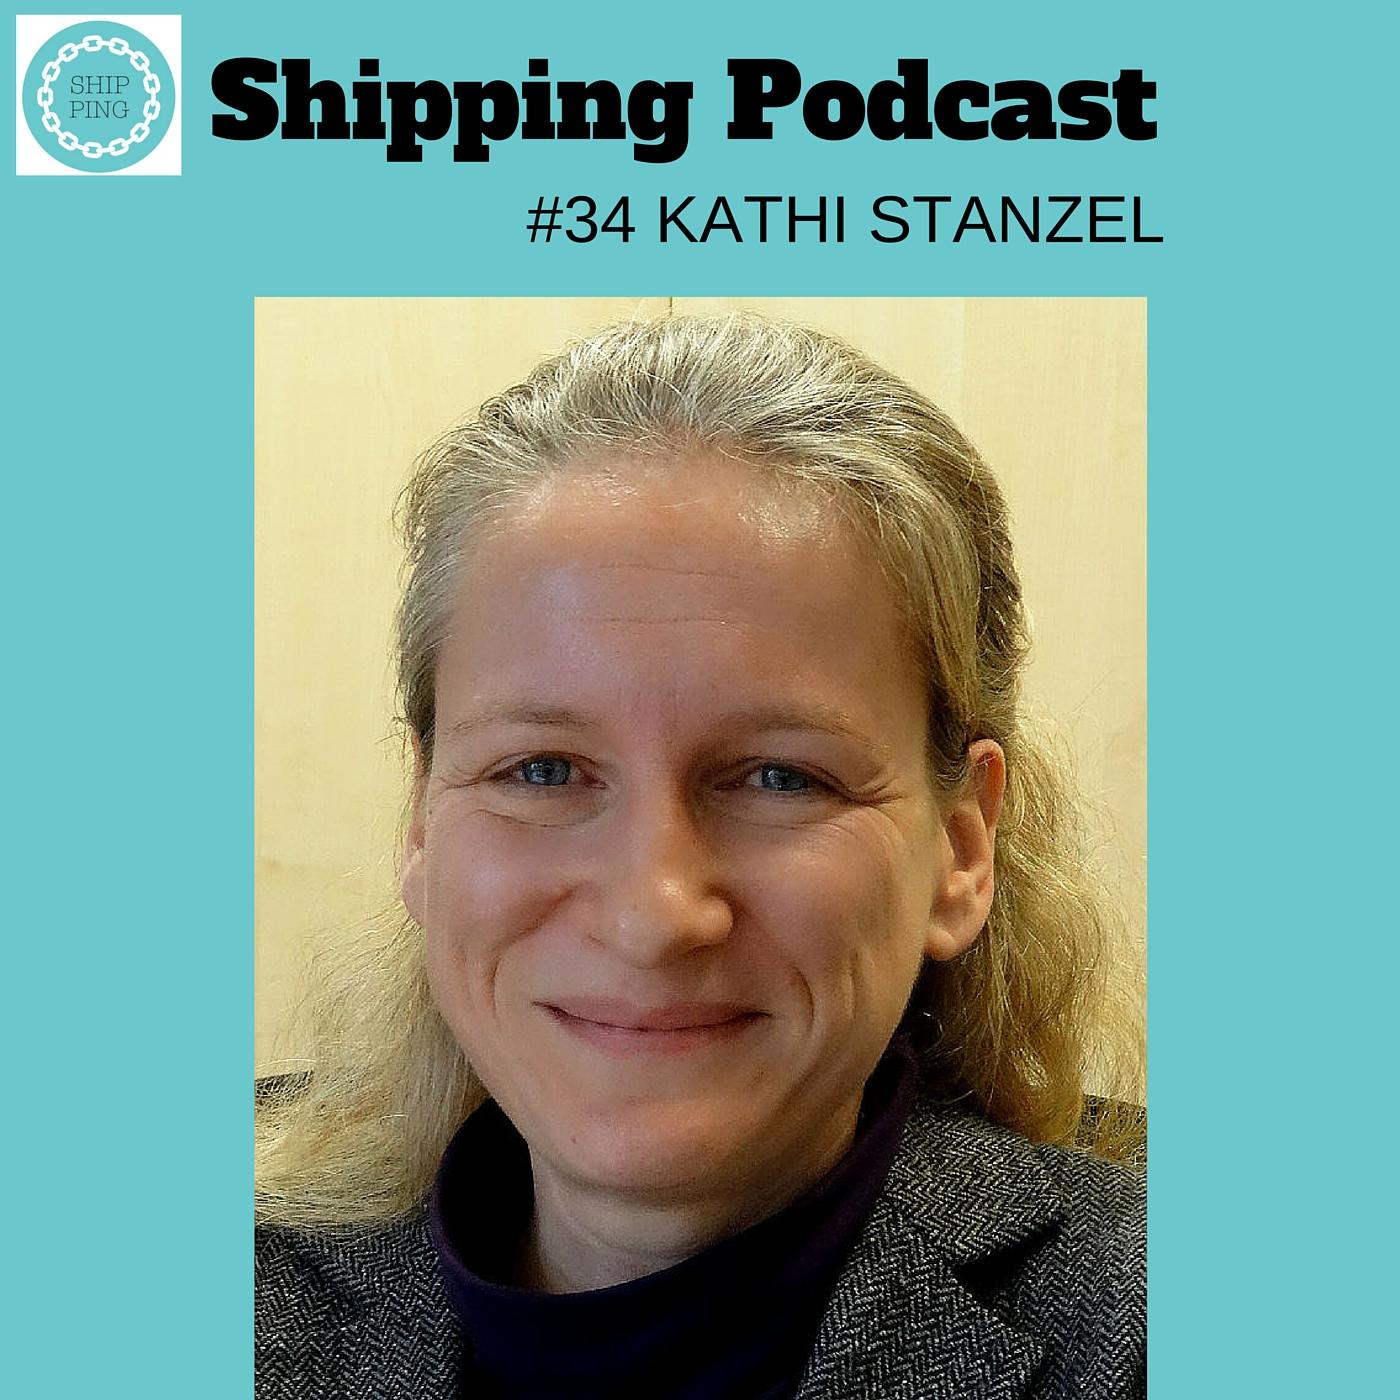 Kathi Stanzel